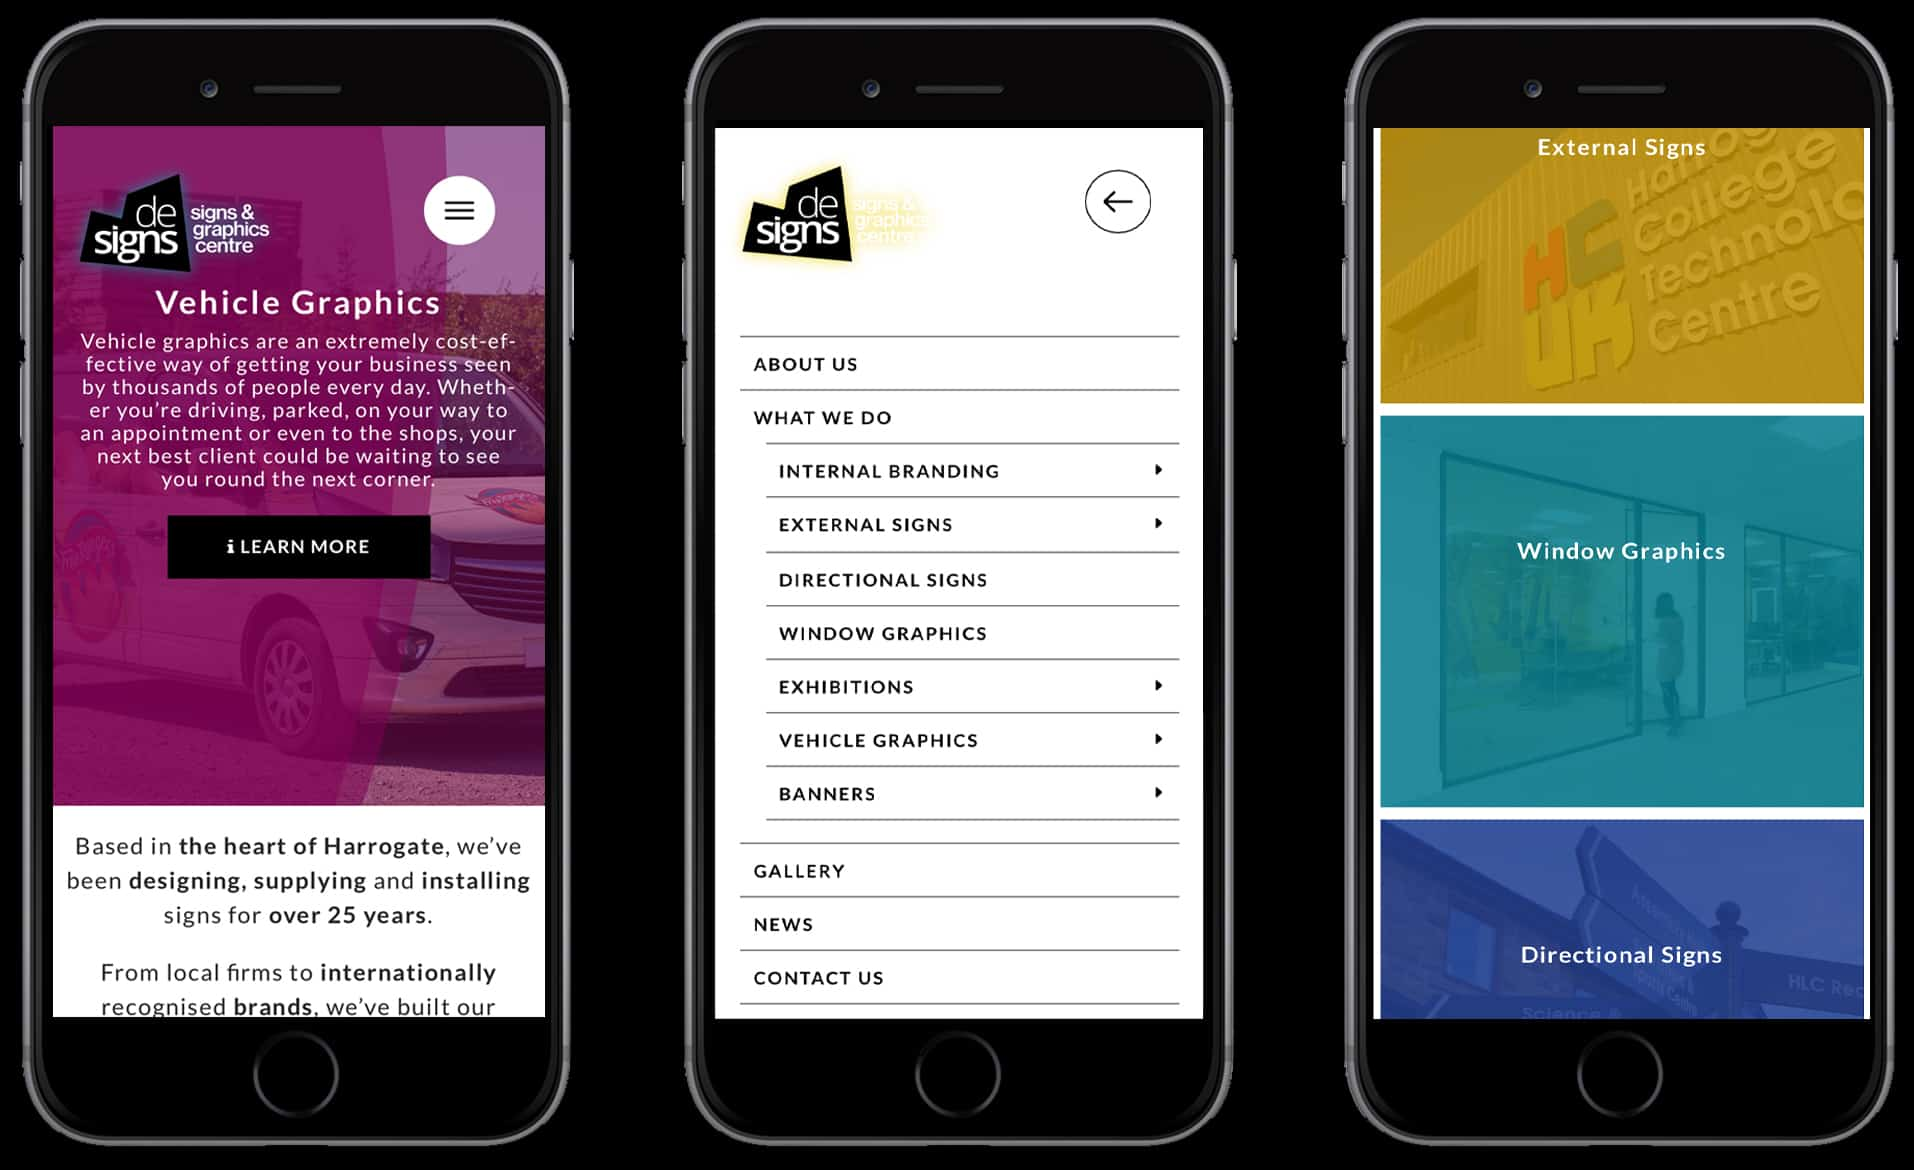 Three example of mobile display of De Signs Harrogate website